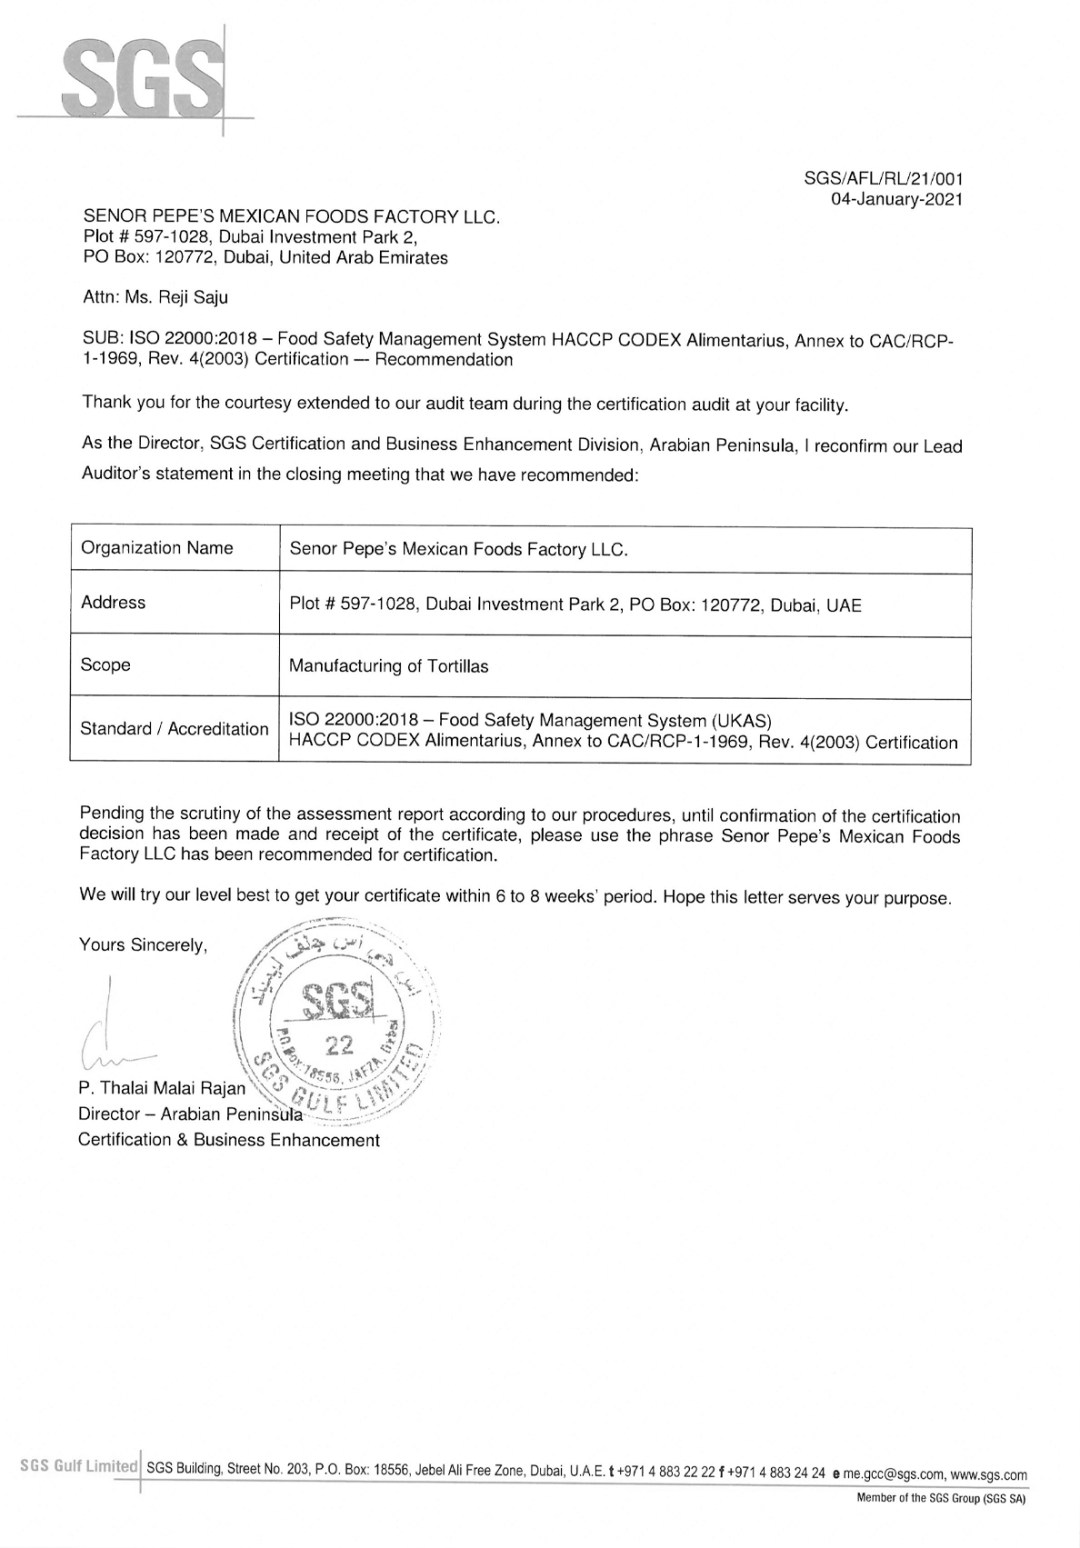 Senor Pepes Certification 4